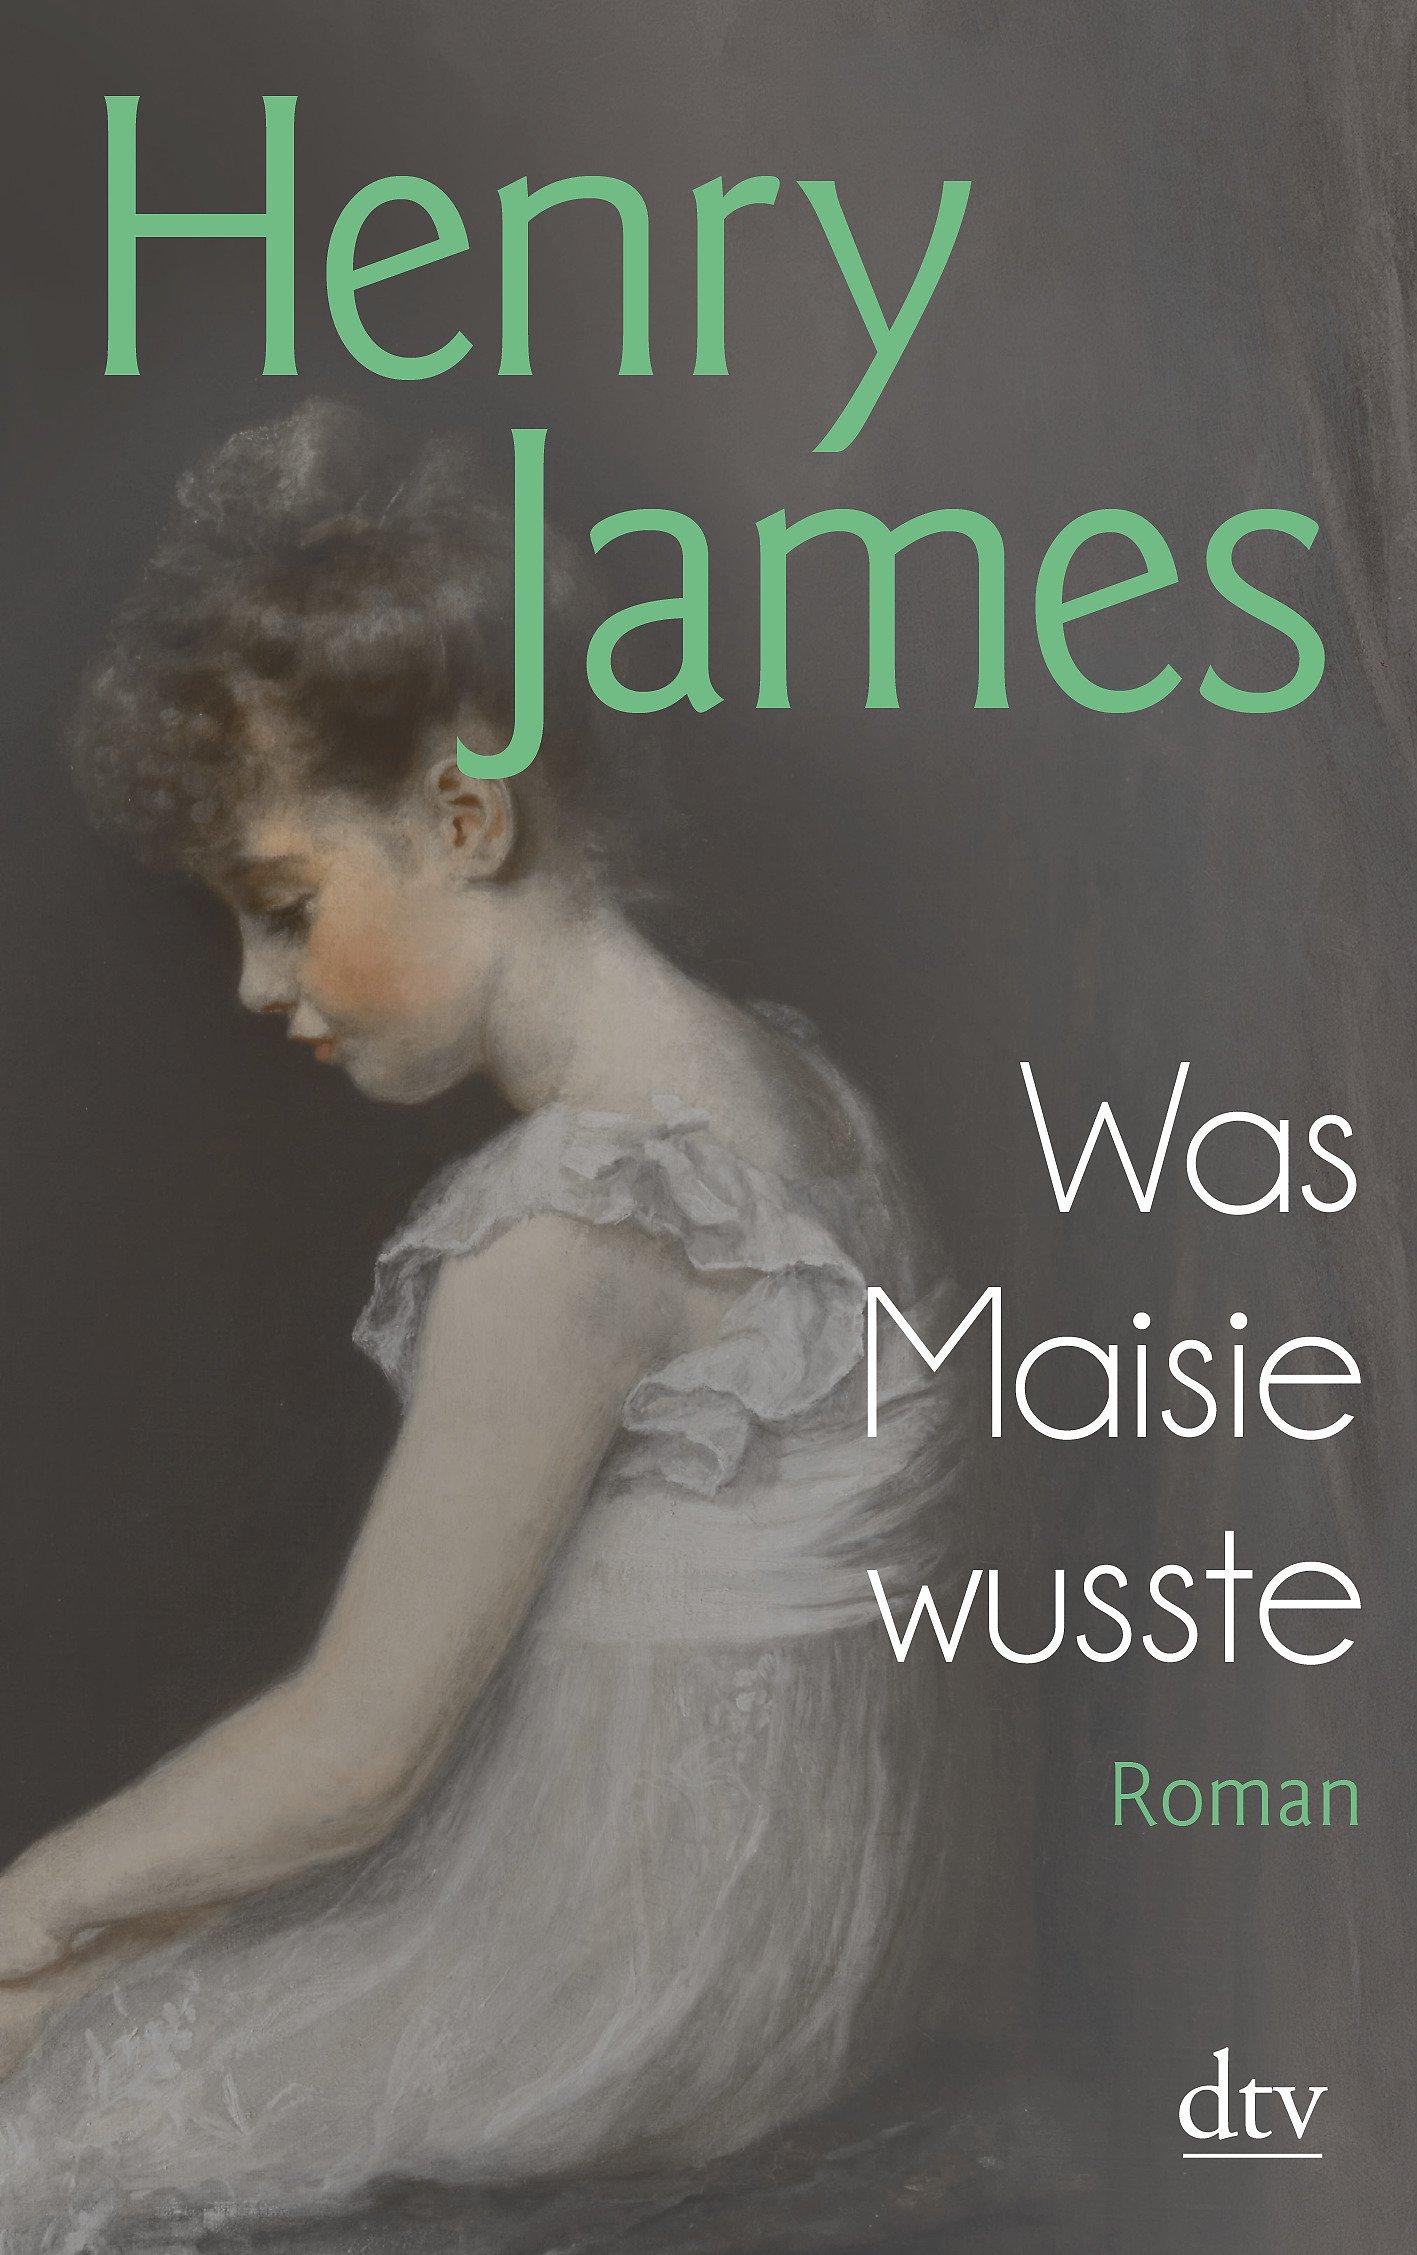 Was Maisie wusste: Roman